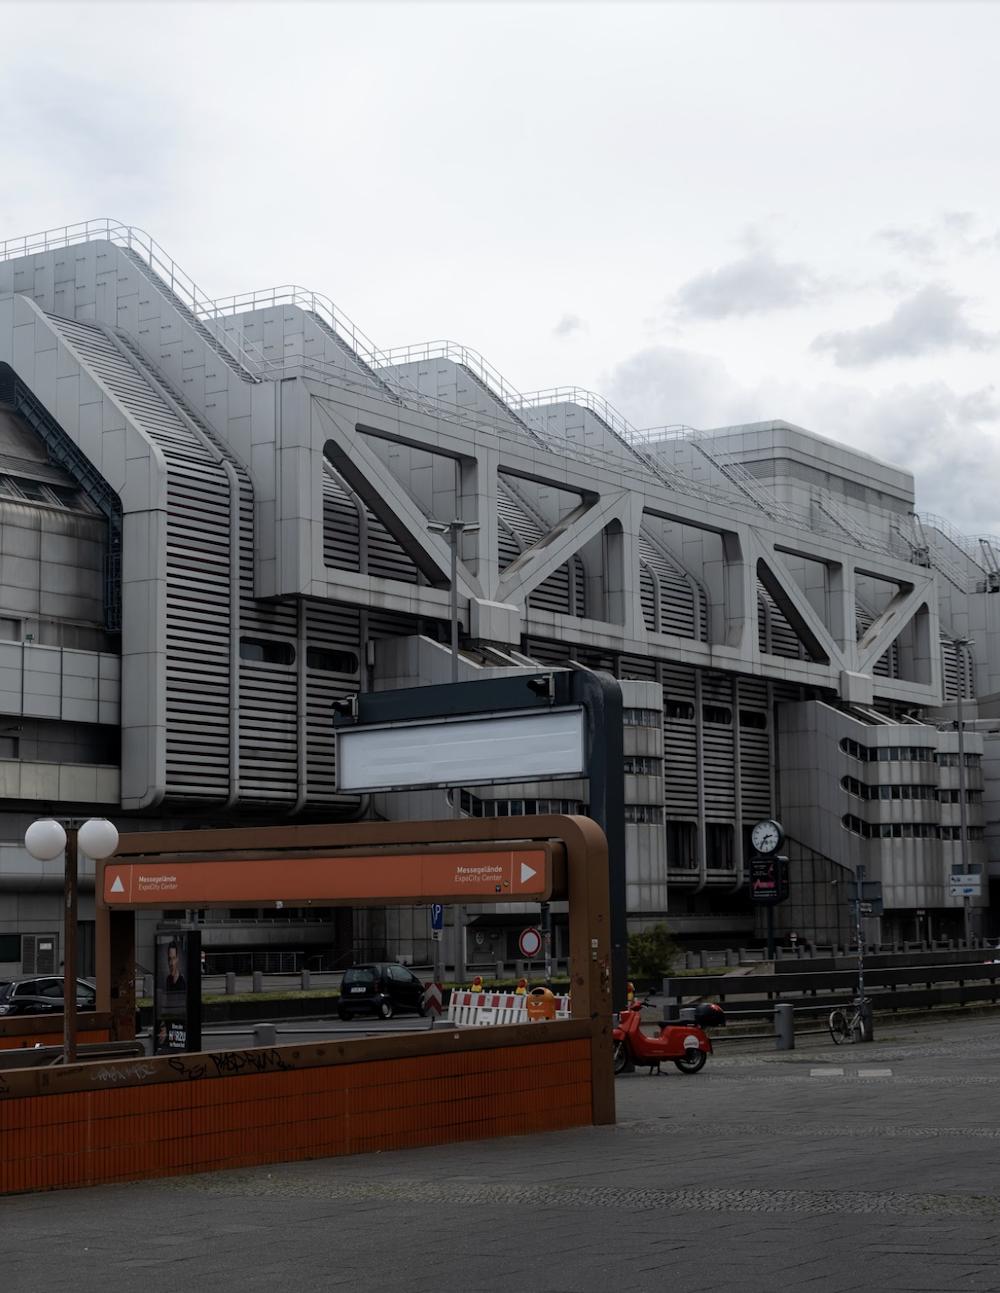 ICC best place to take photos in Berlin shot by Elvira Nisman